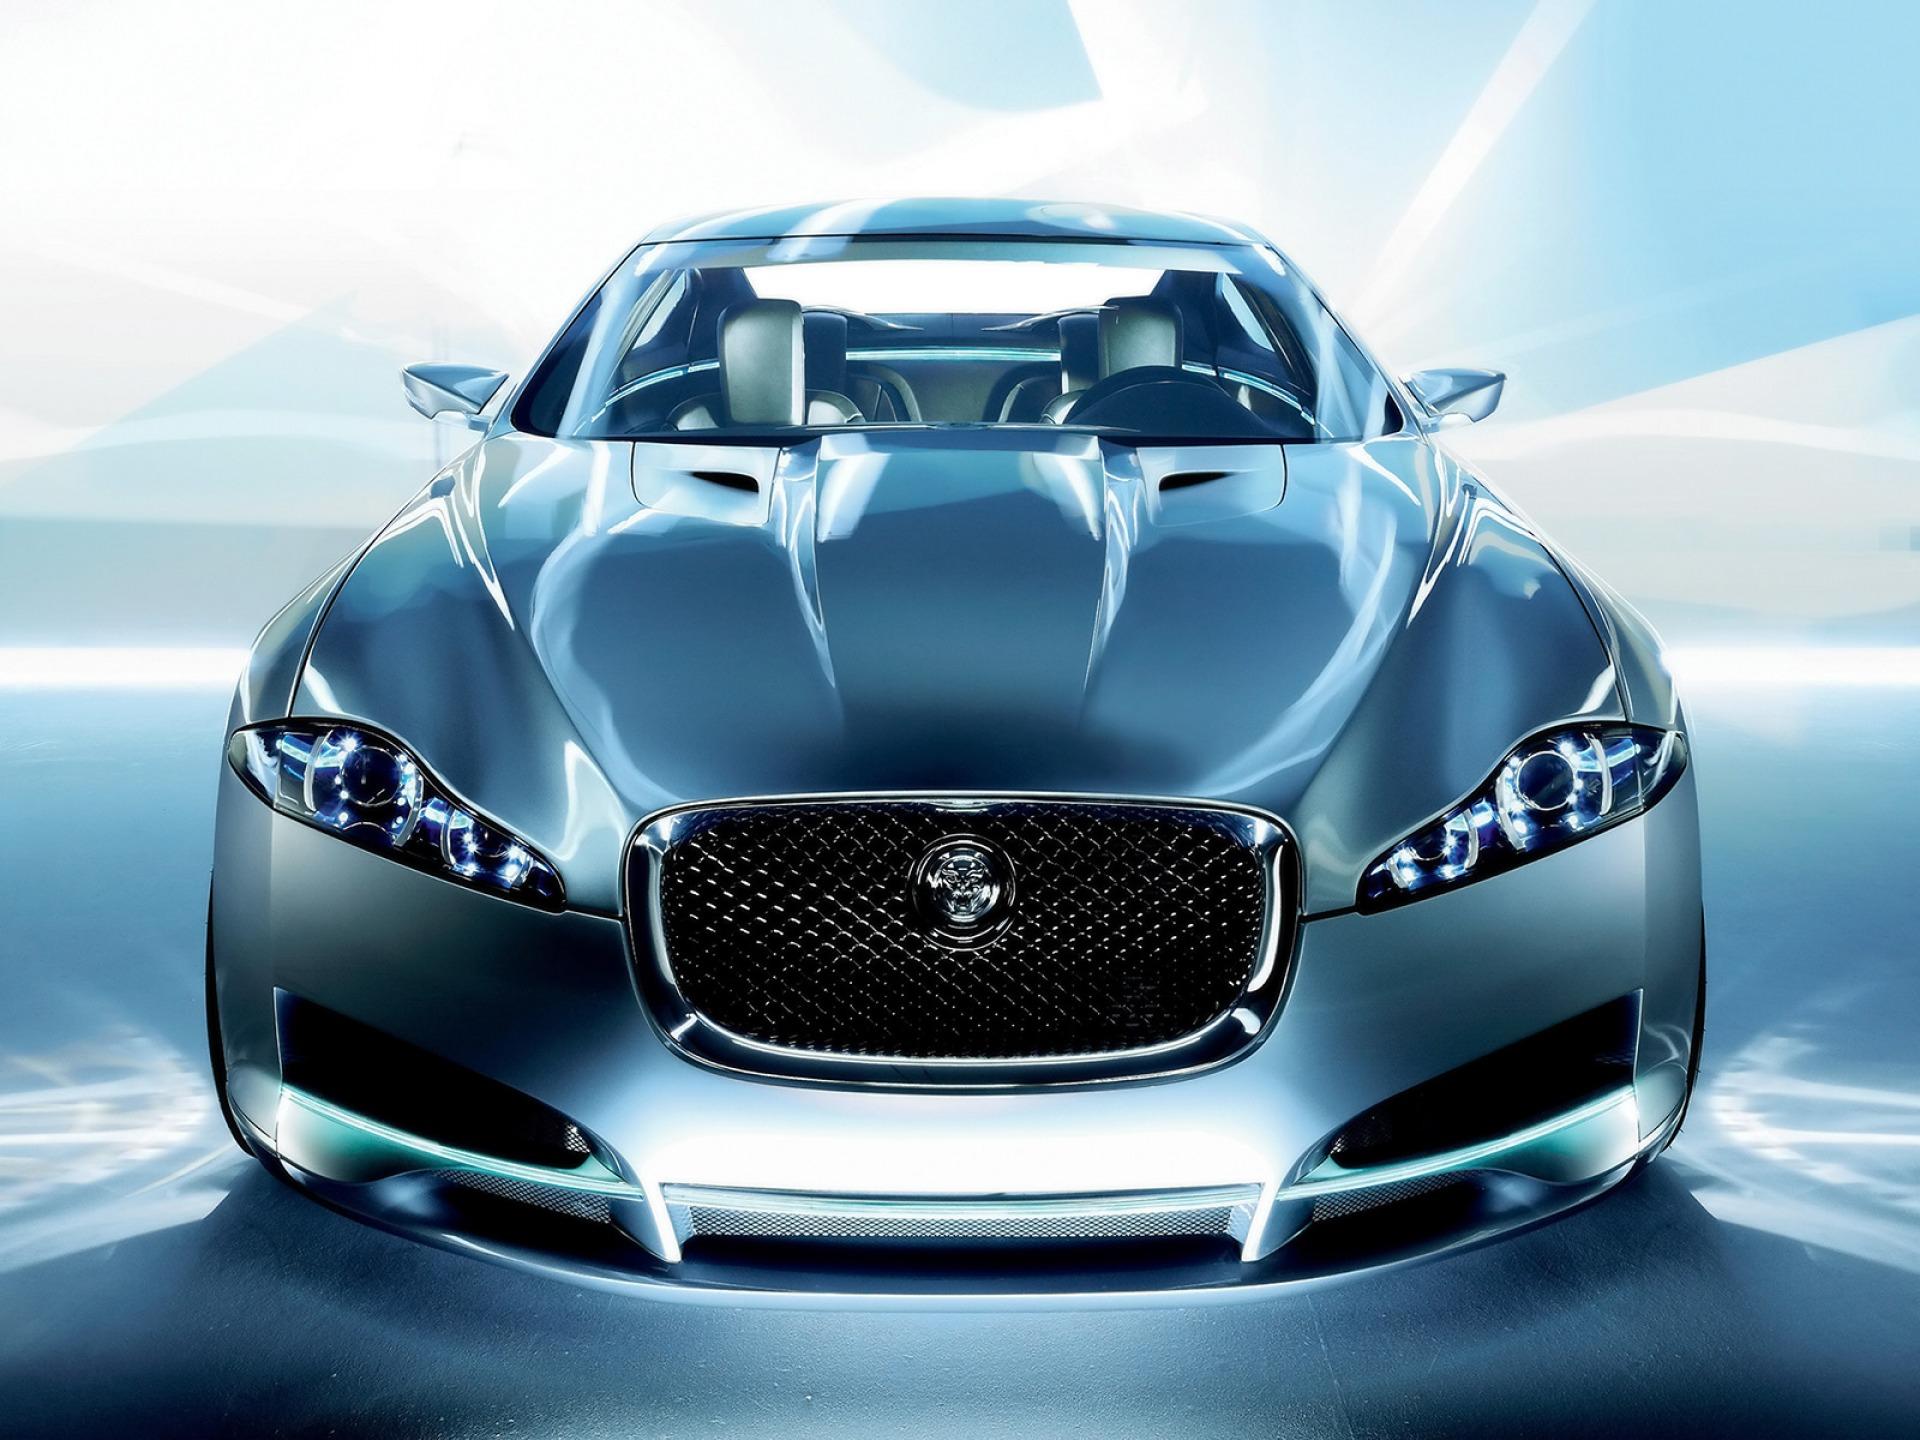 Jaguar C Xf Front Wallpaper Concept Cars Wallpapers In Jpg Format